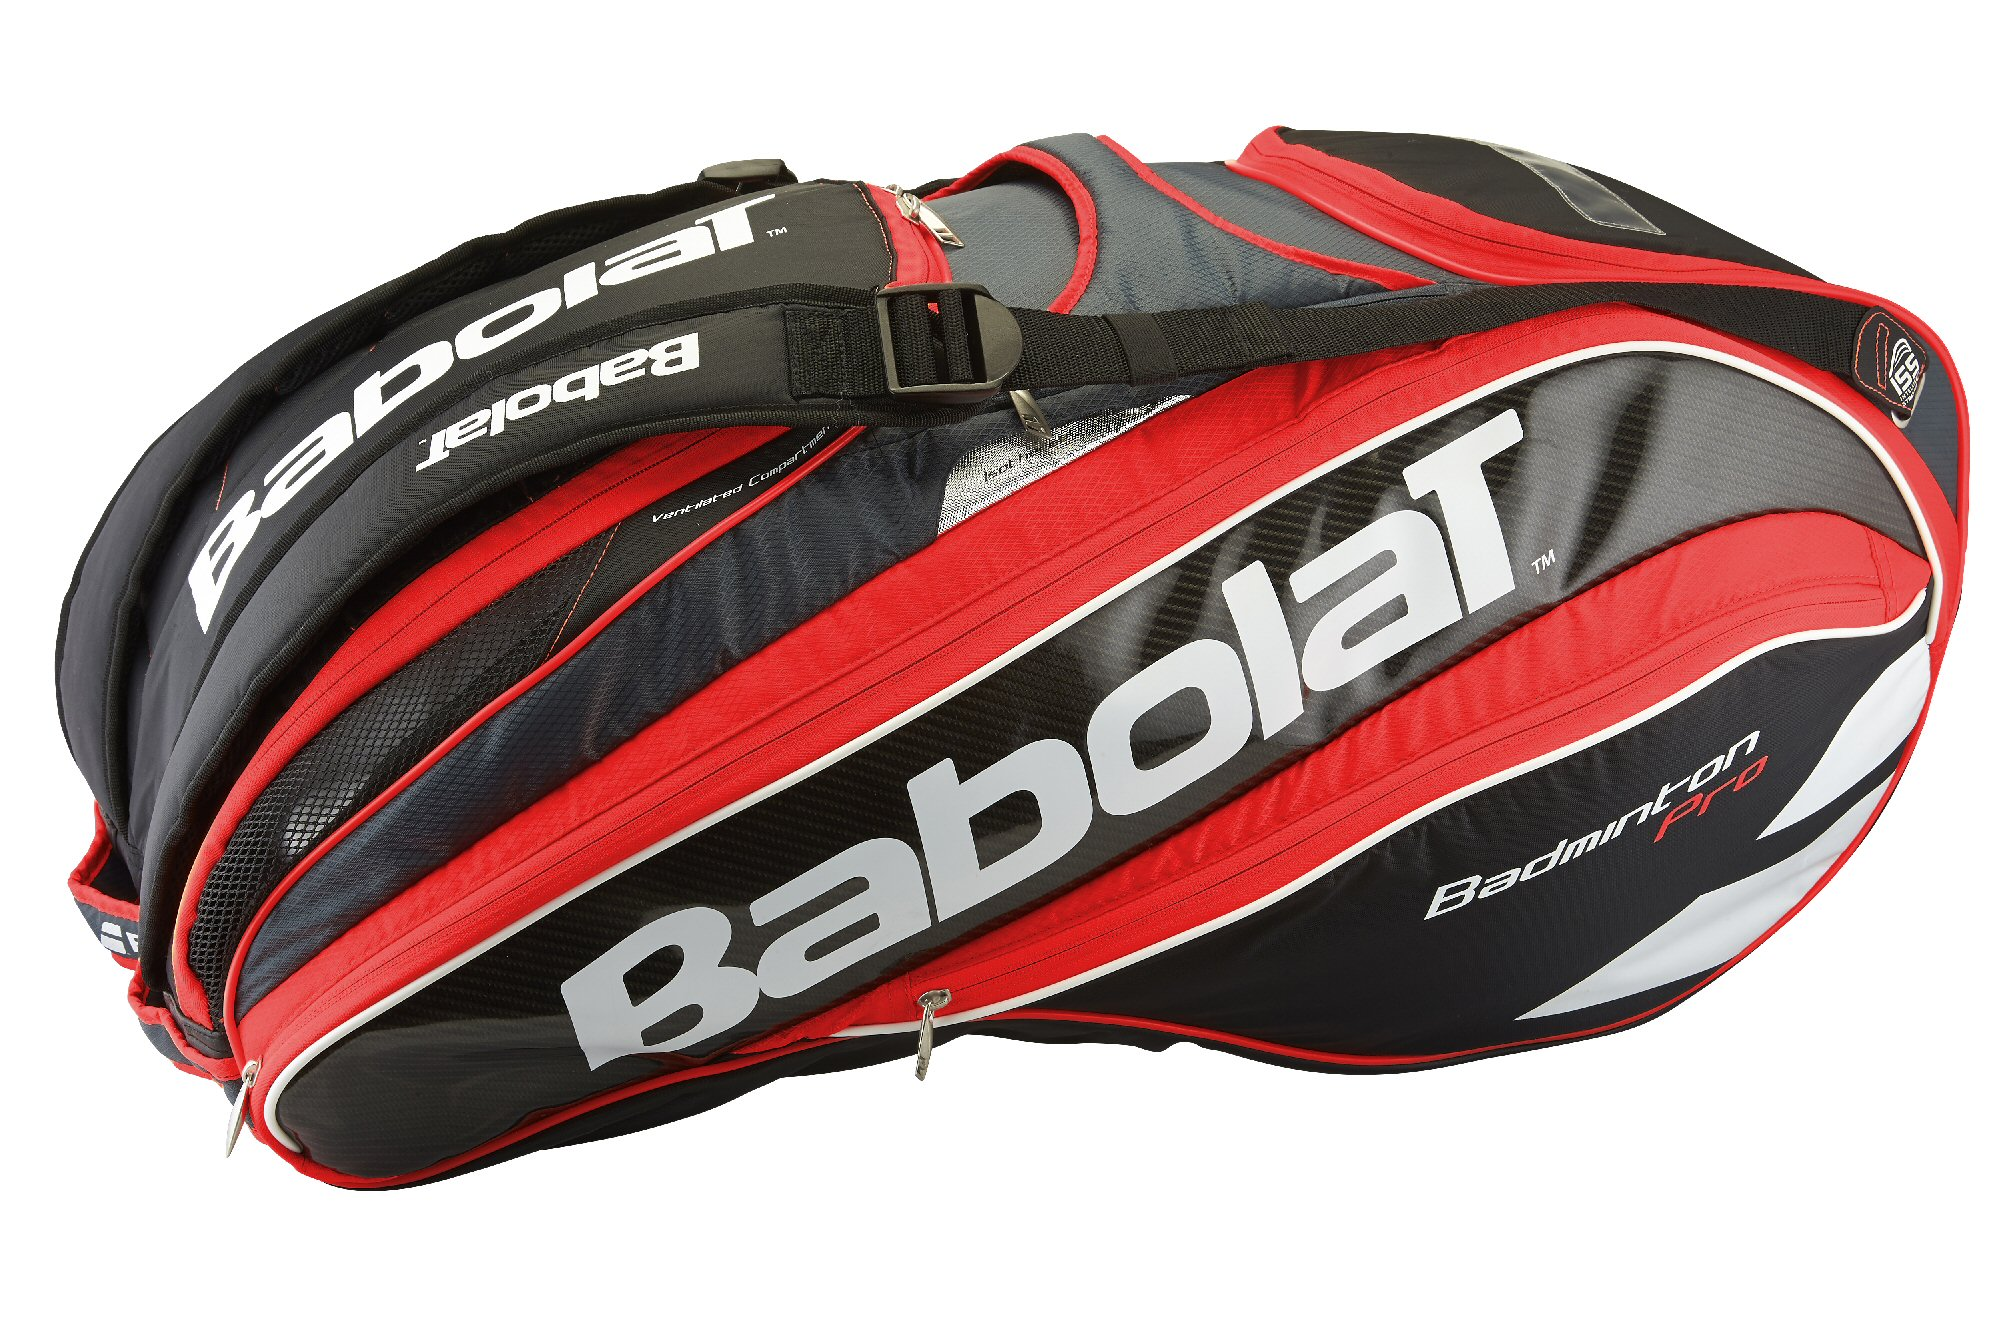 Babolat Badminton Pro Line Racket Holder X16 2015